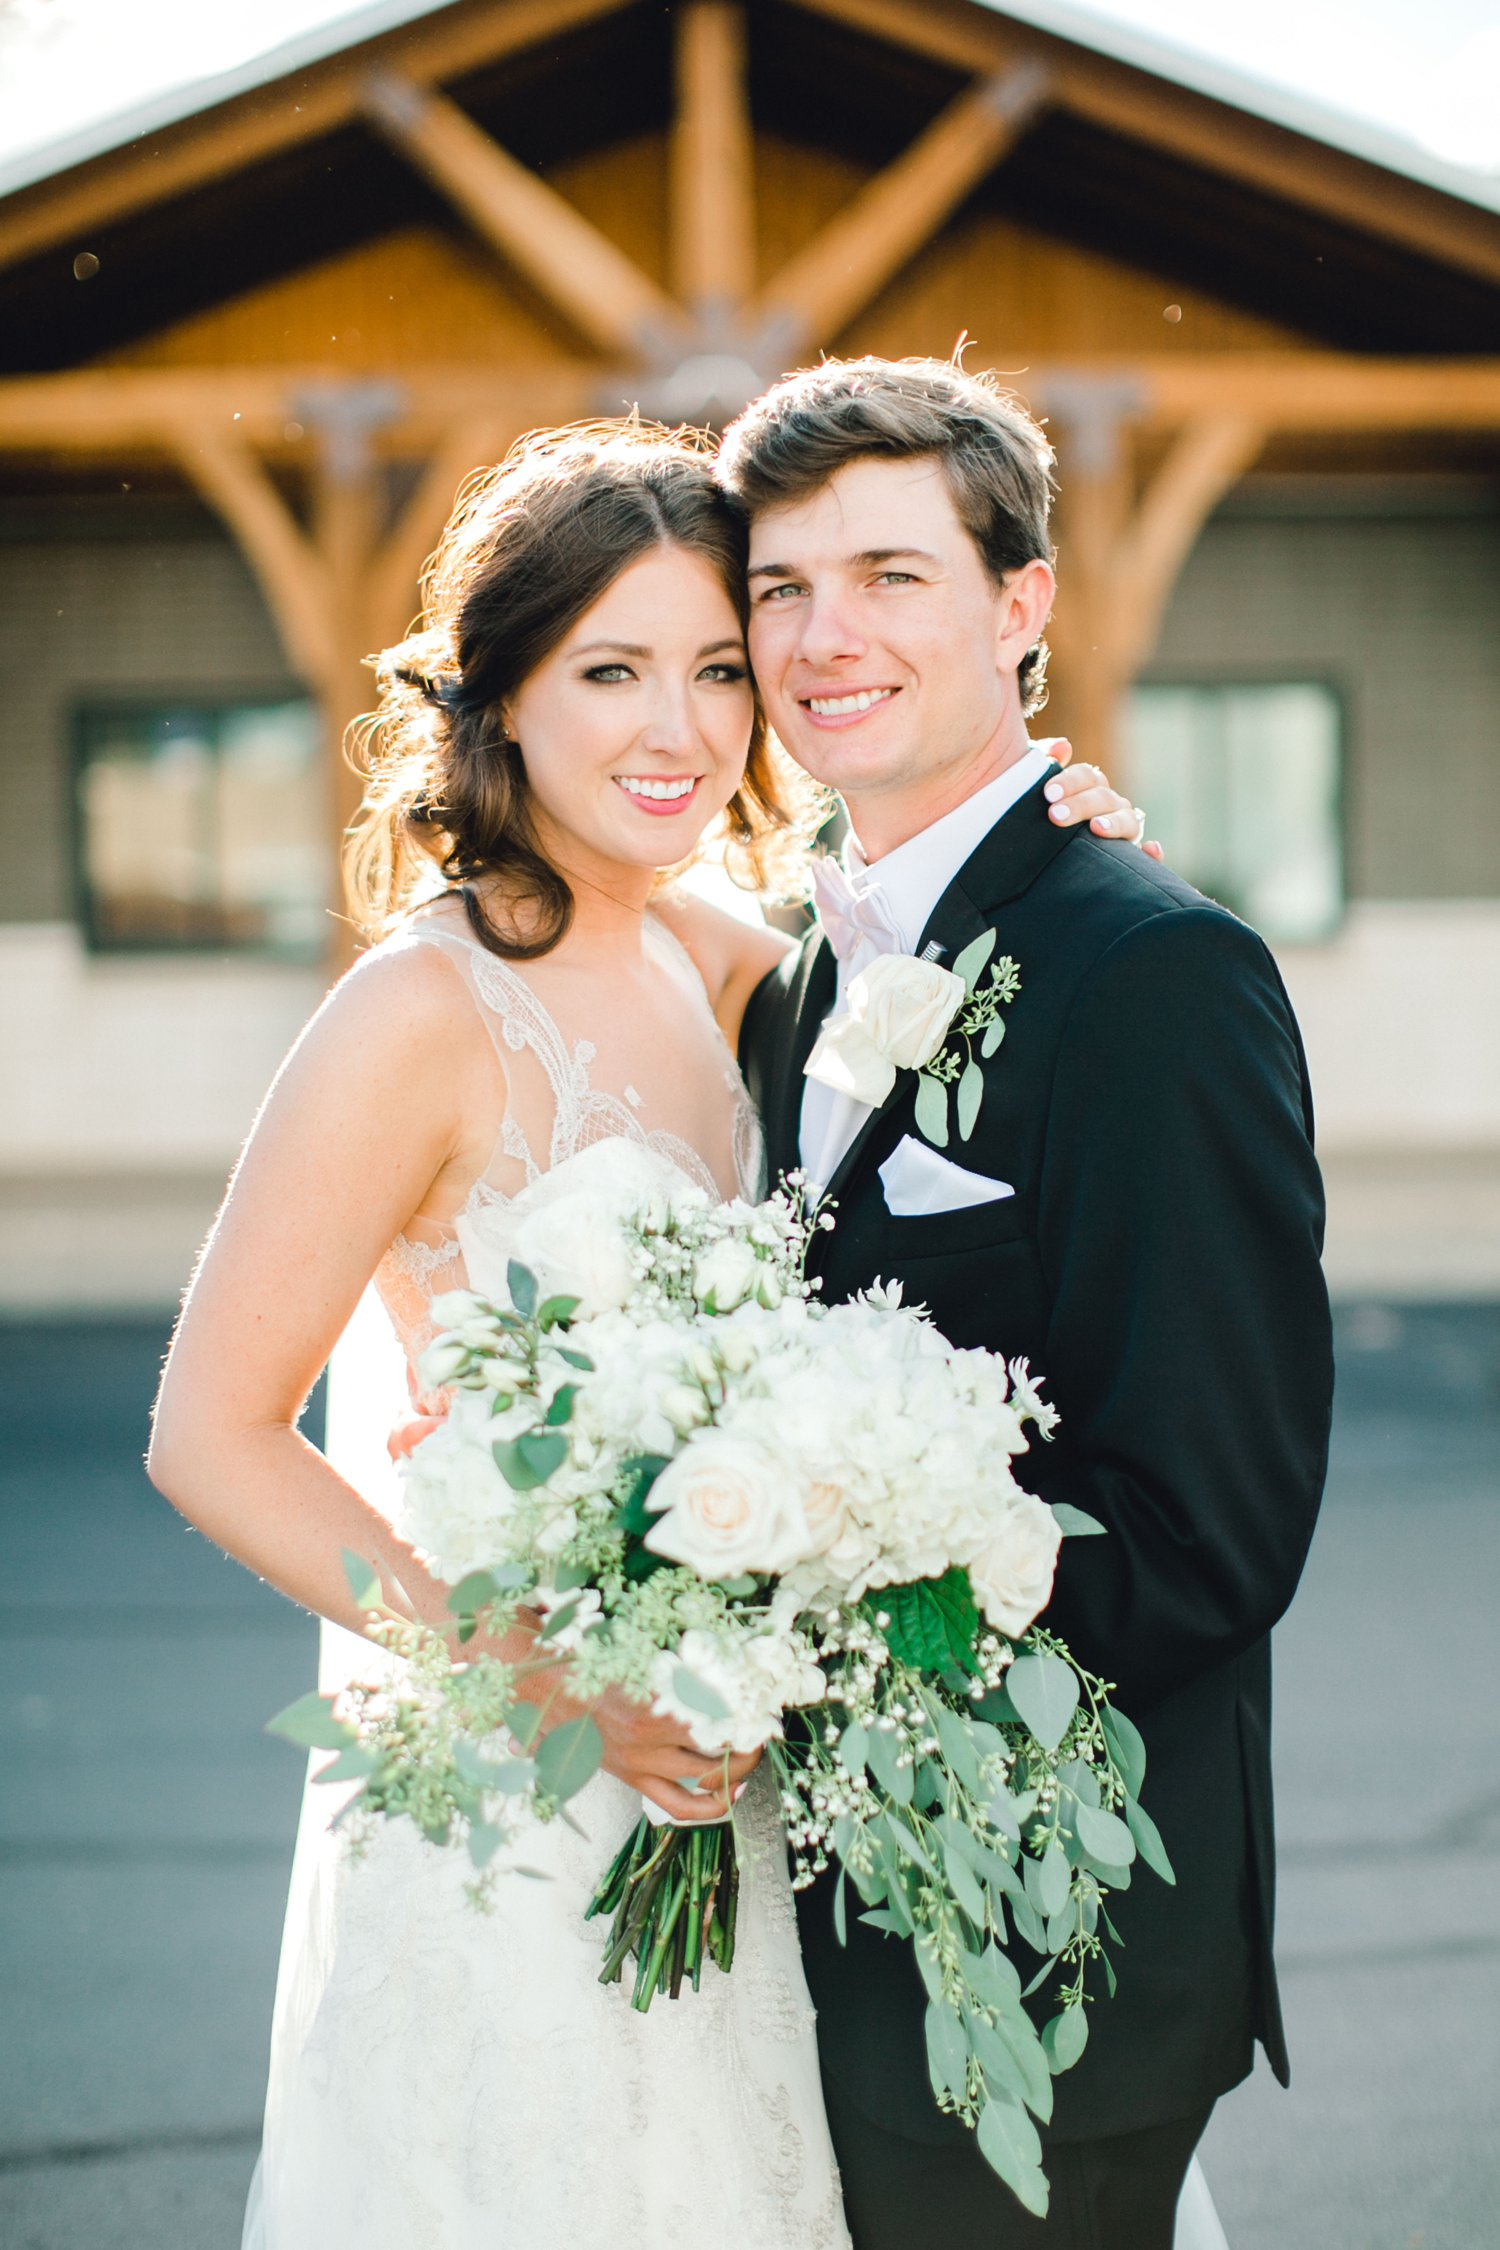 Hunter_and_Molly_Rawls_ALLEEJ_Lubbock_WEDDING_Legacy_Event_Center_0132.jpg